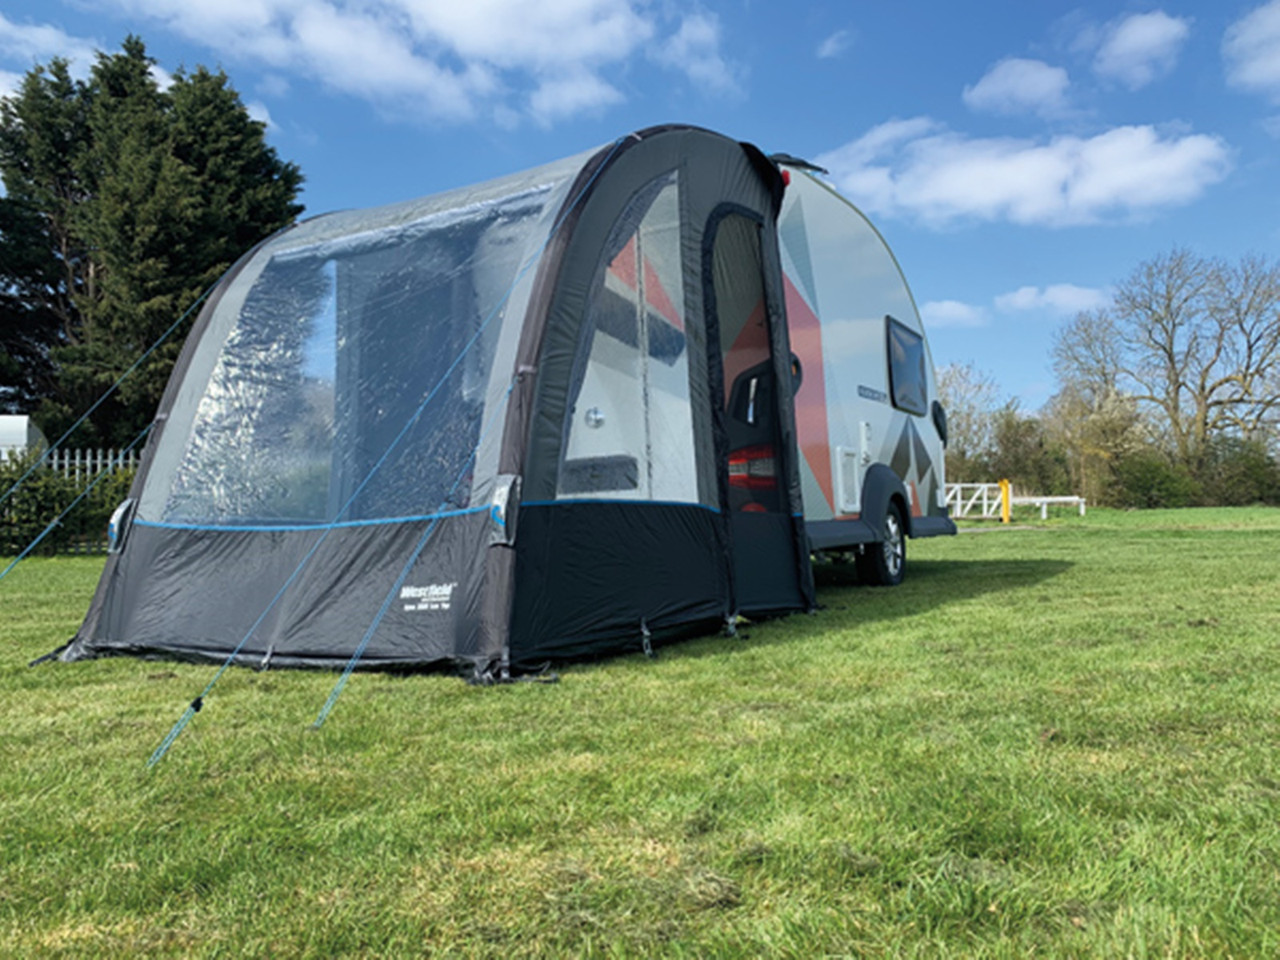 Westfield Lynx 200 Swift Basecamp Caravan Awning - OBI ...